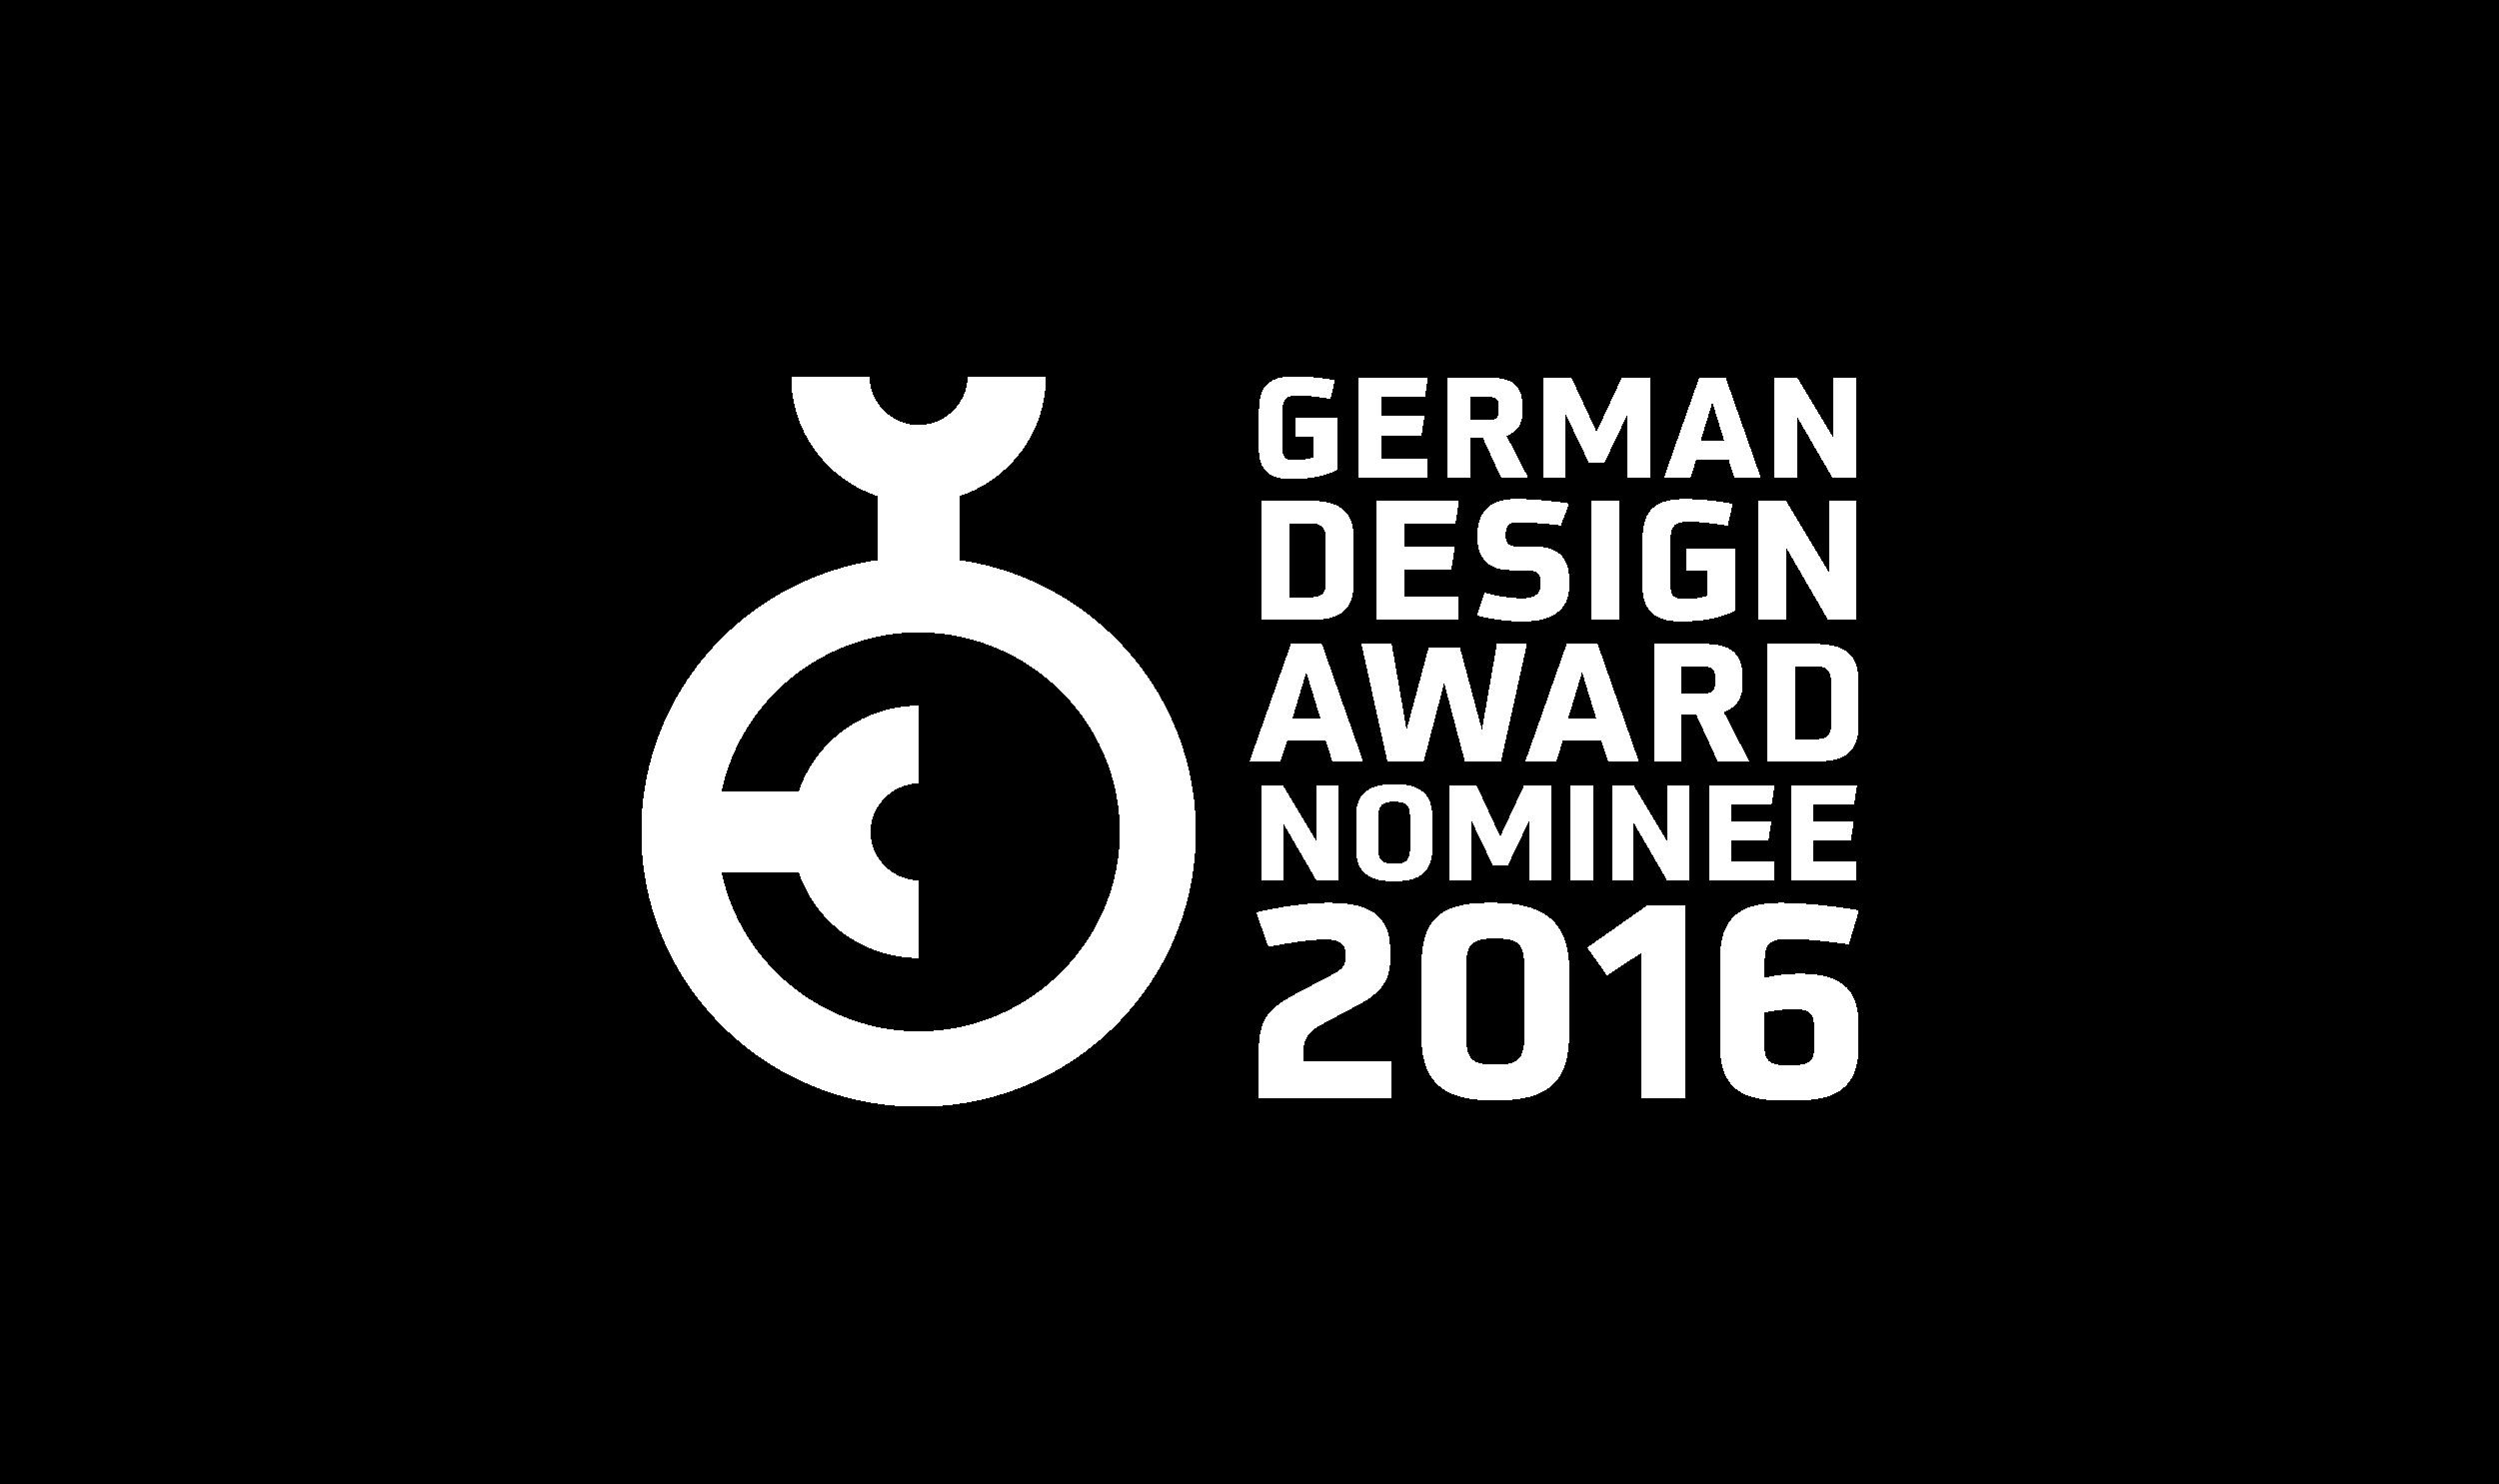 German_Design_Award_Nominee_2016_small